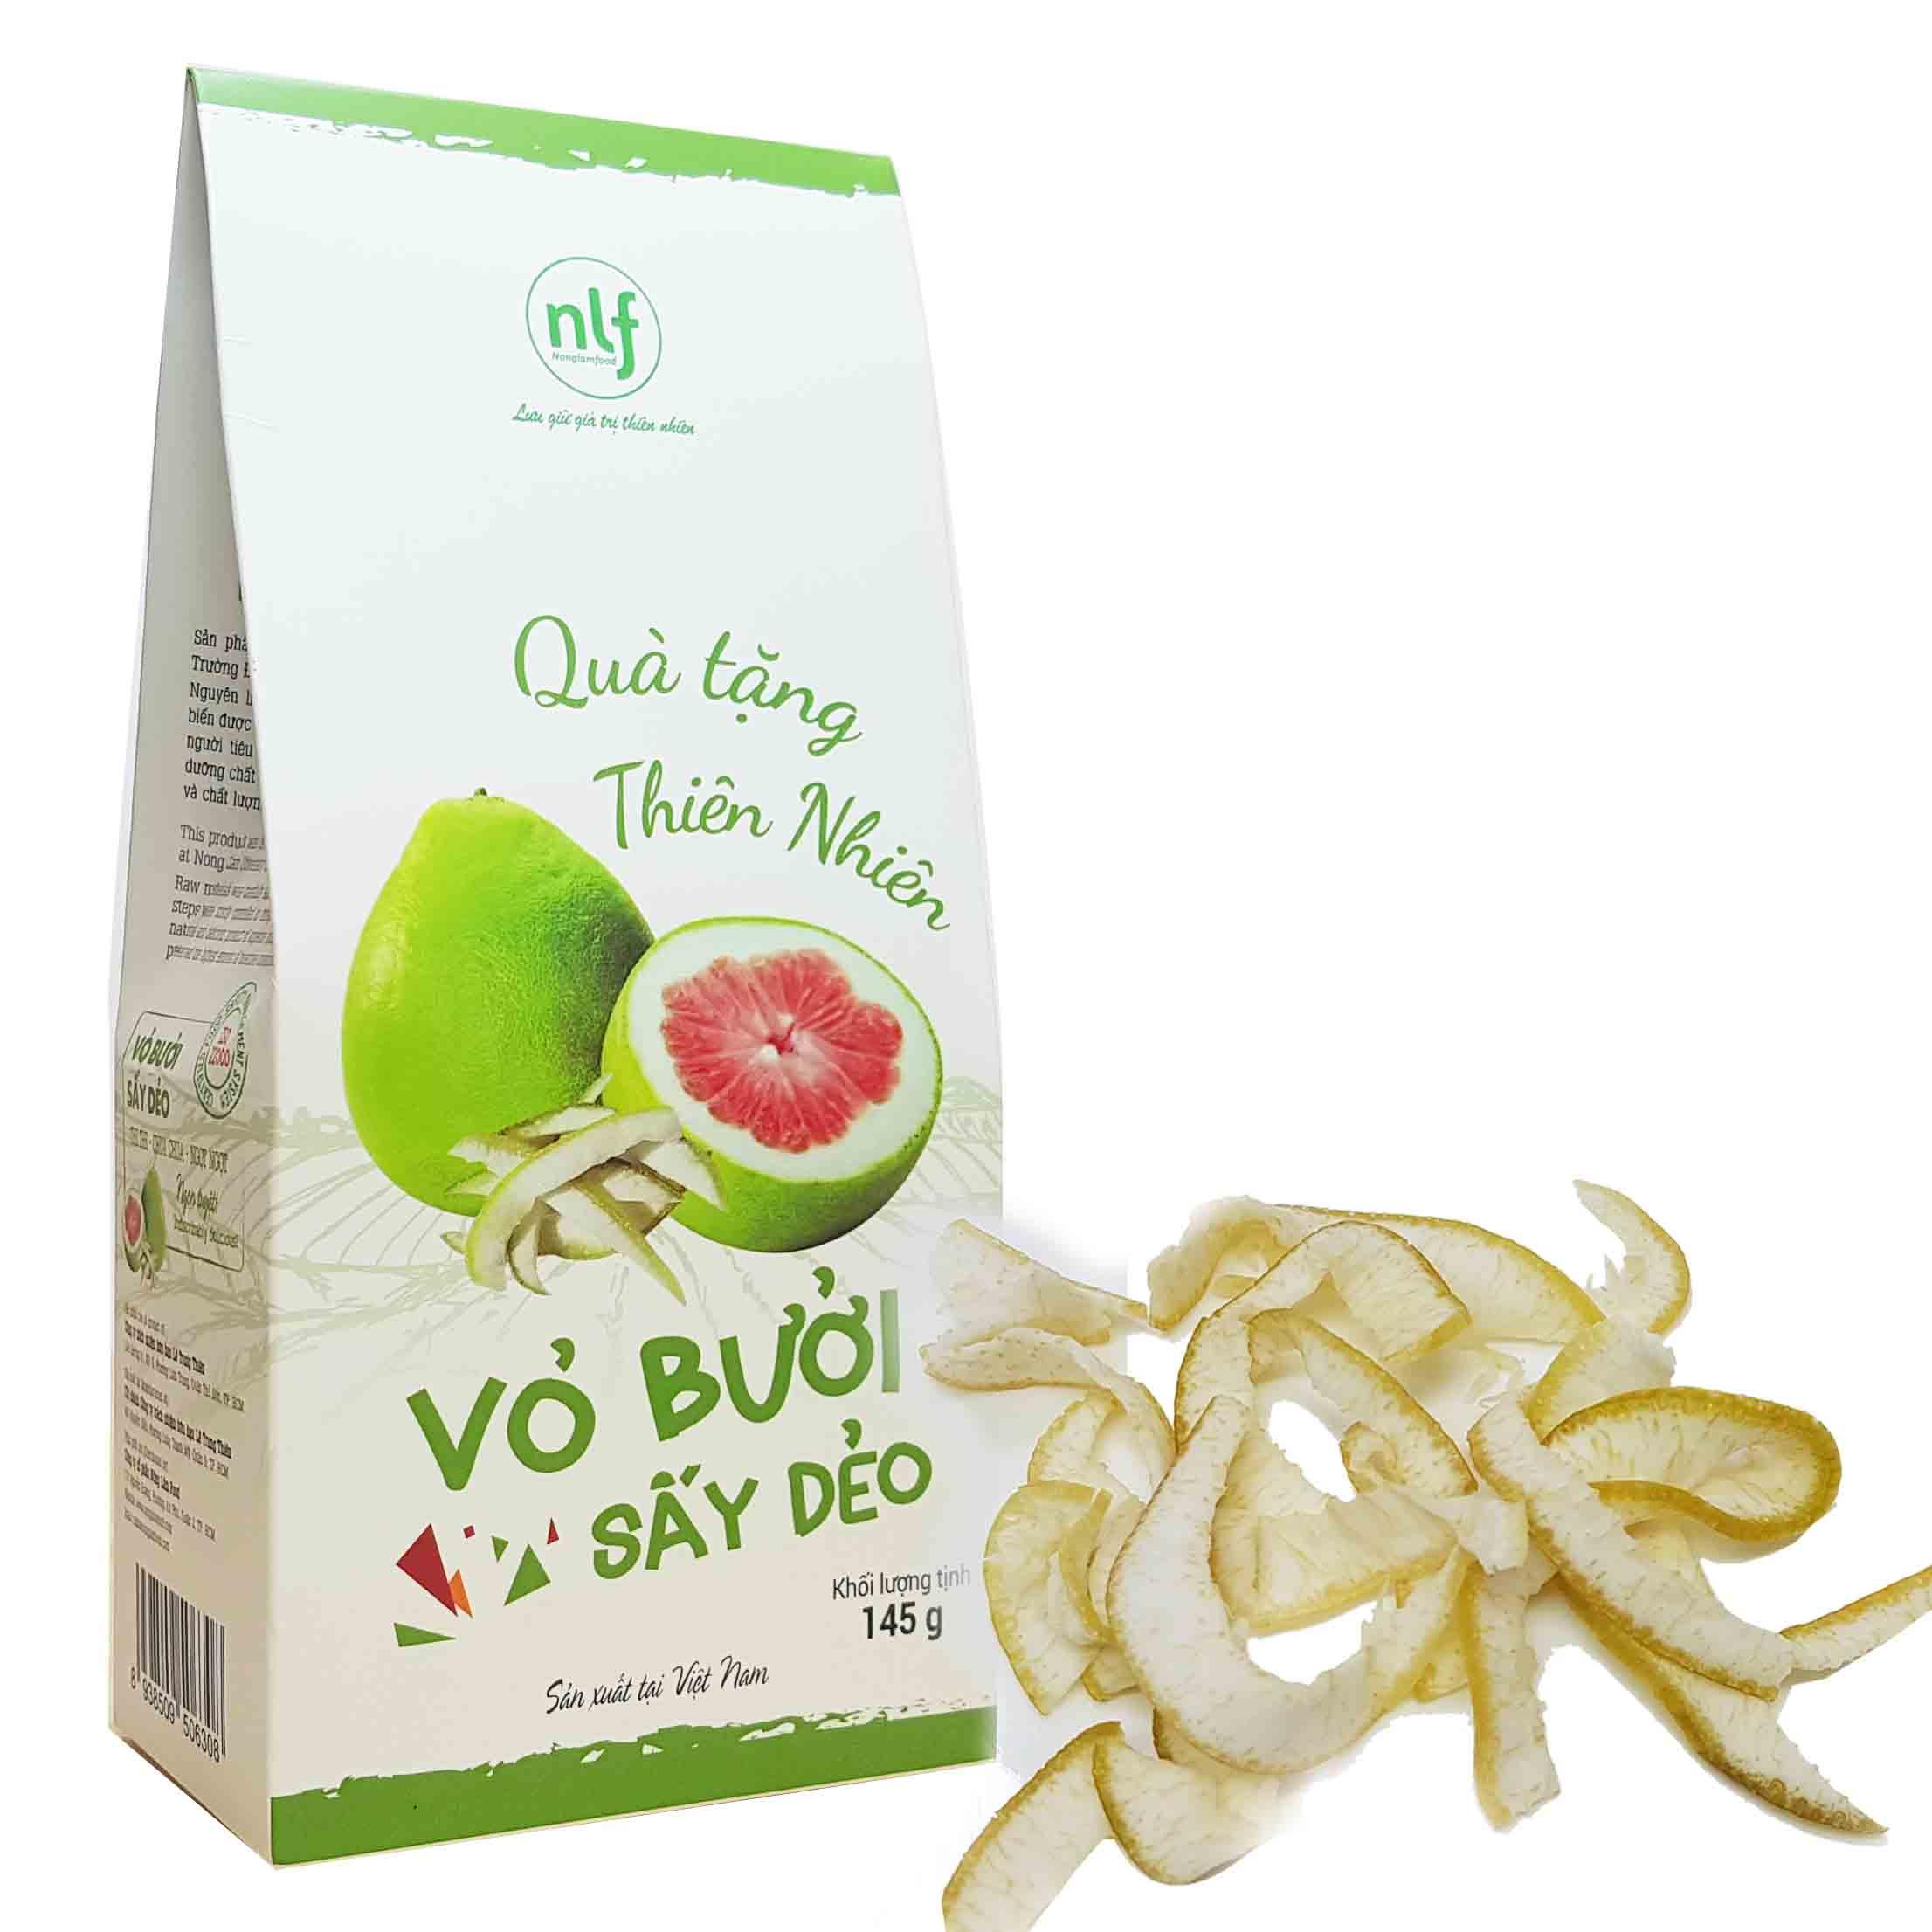 vo-buoi-say-deo-145g1.jpg